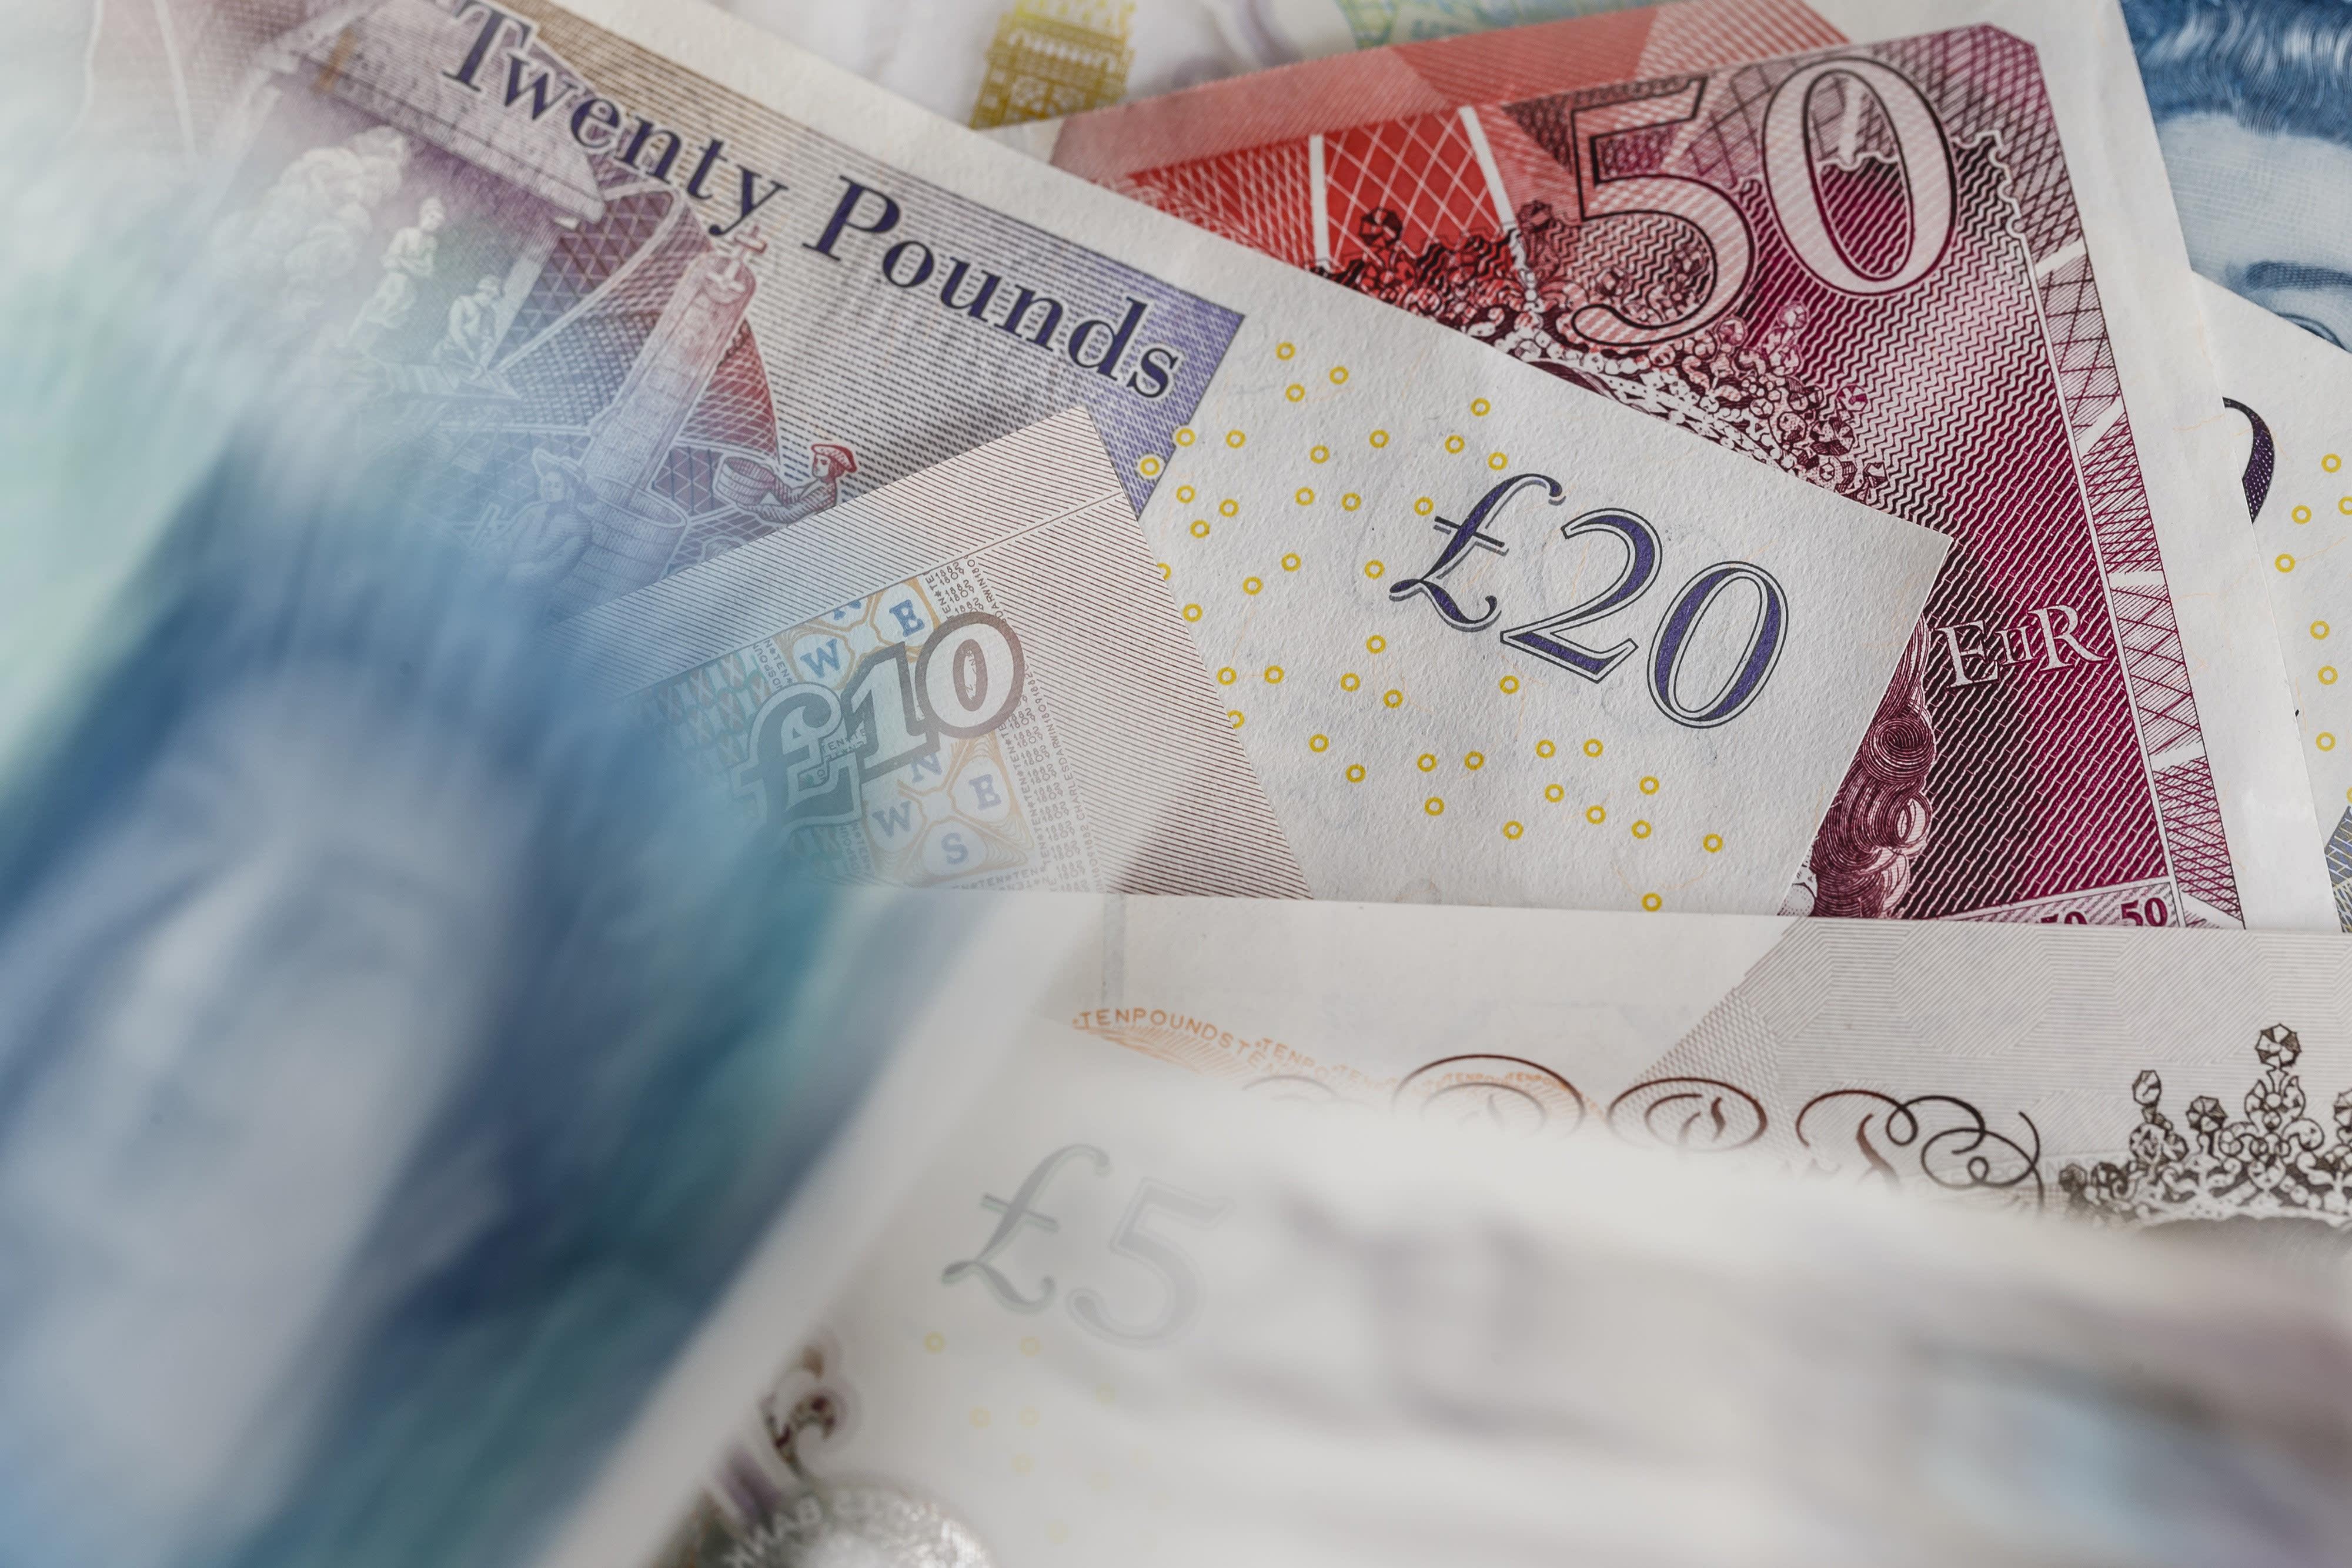 Ascot Lloyd Bellpenny in first post-merger deal